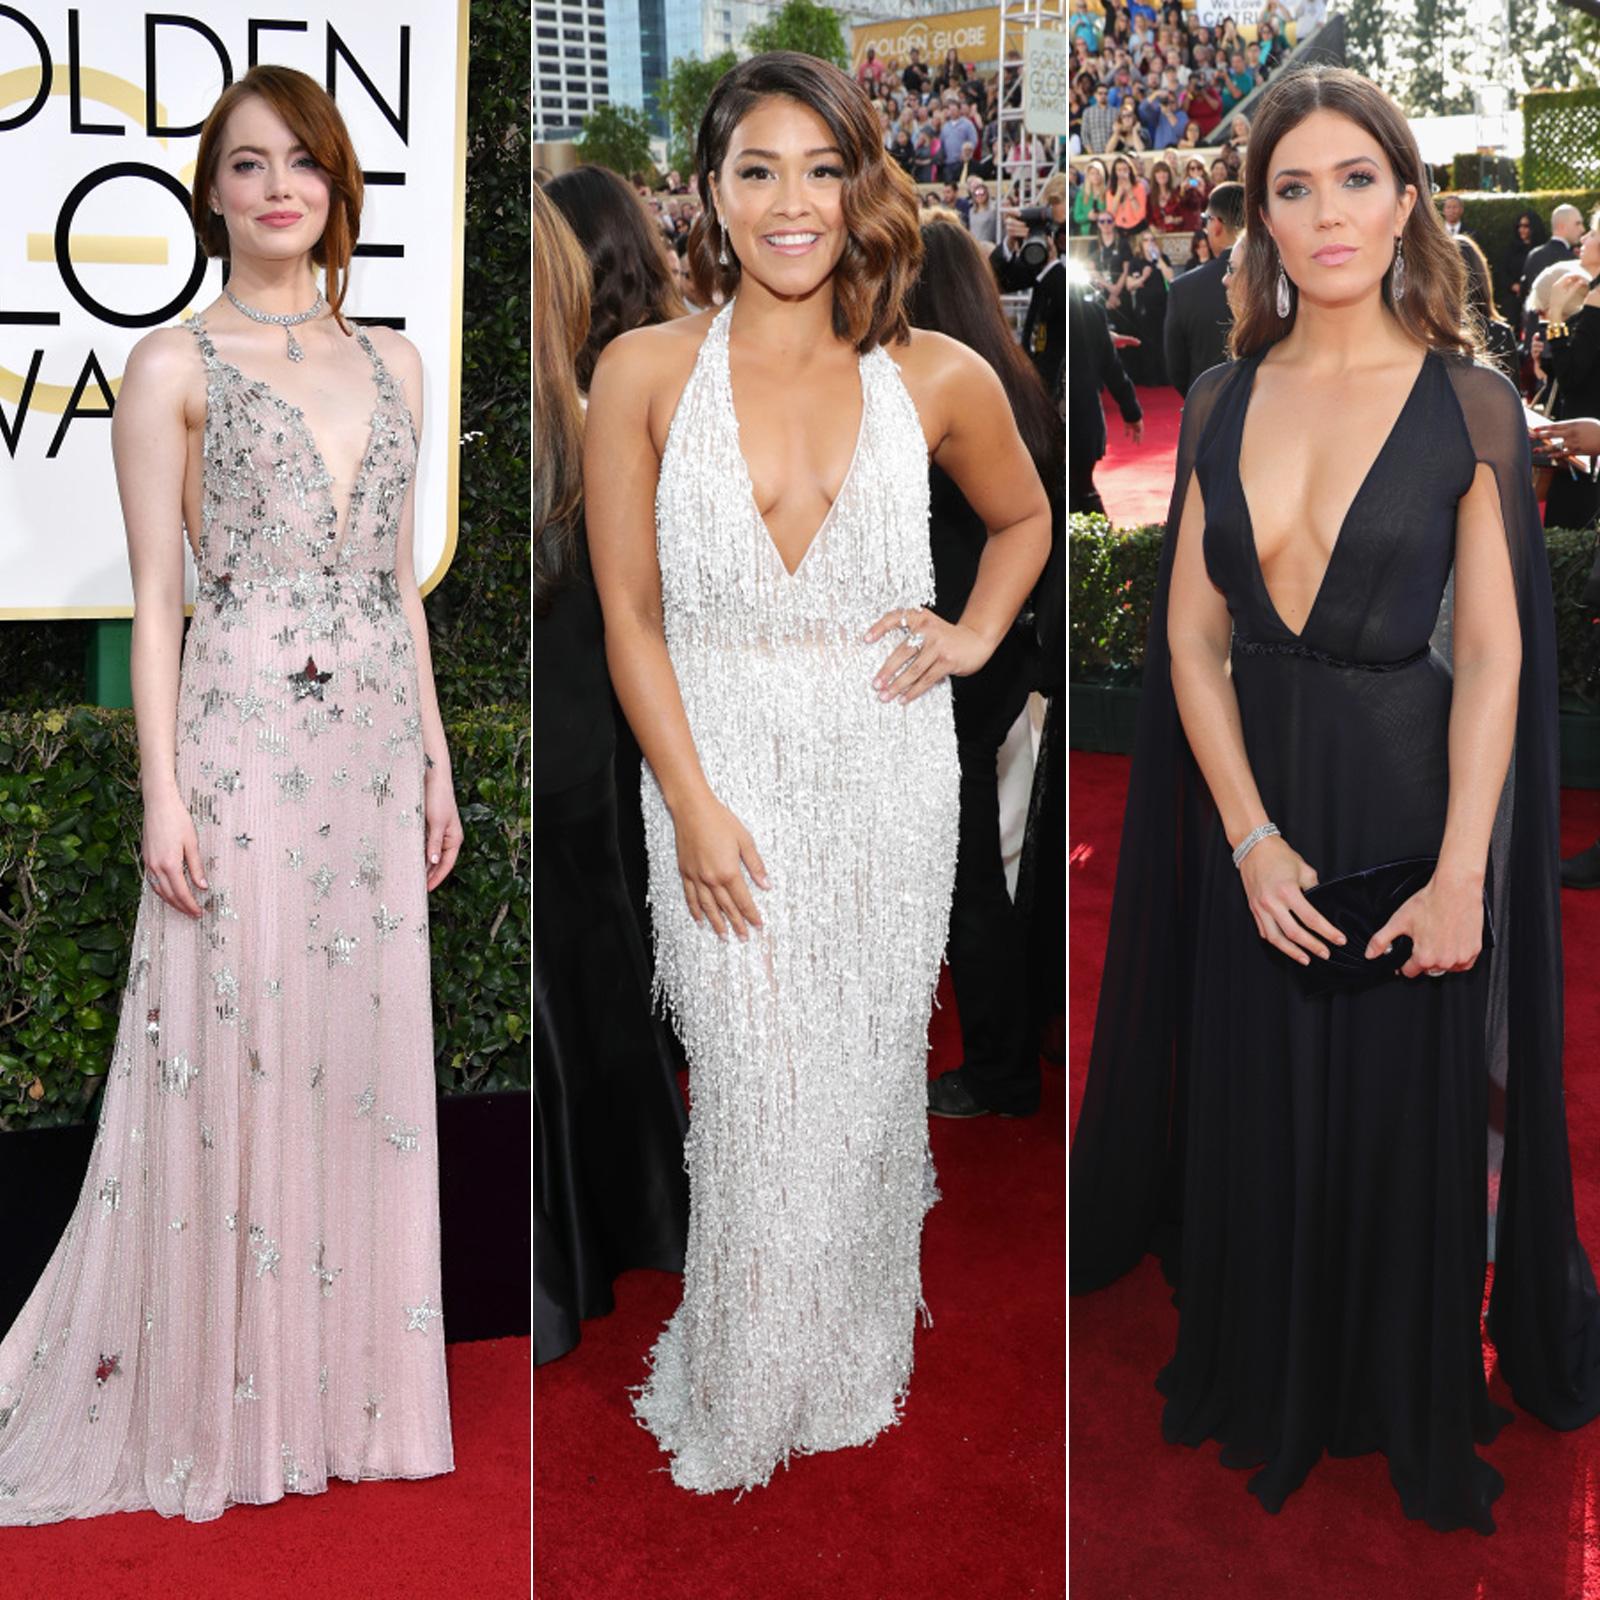 Escotes Golden Globes Emma Stone Gina Rodriguez Mandy Moore